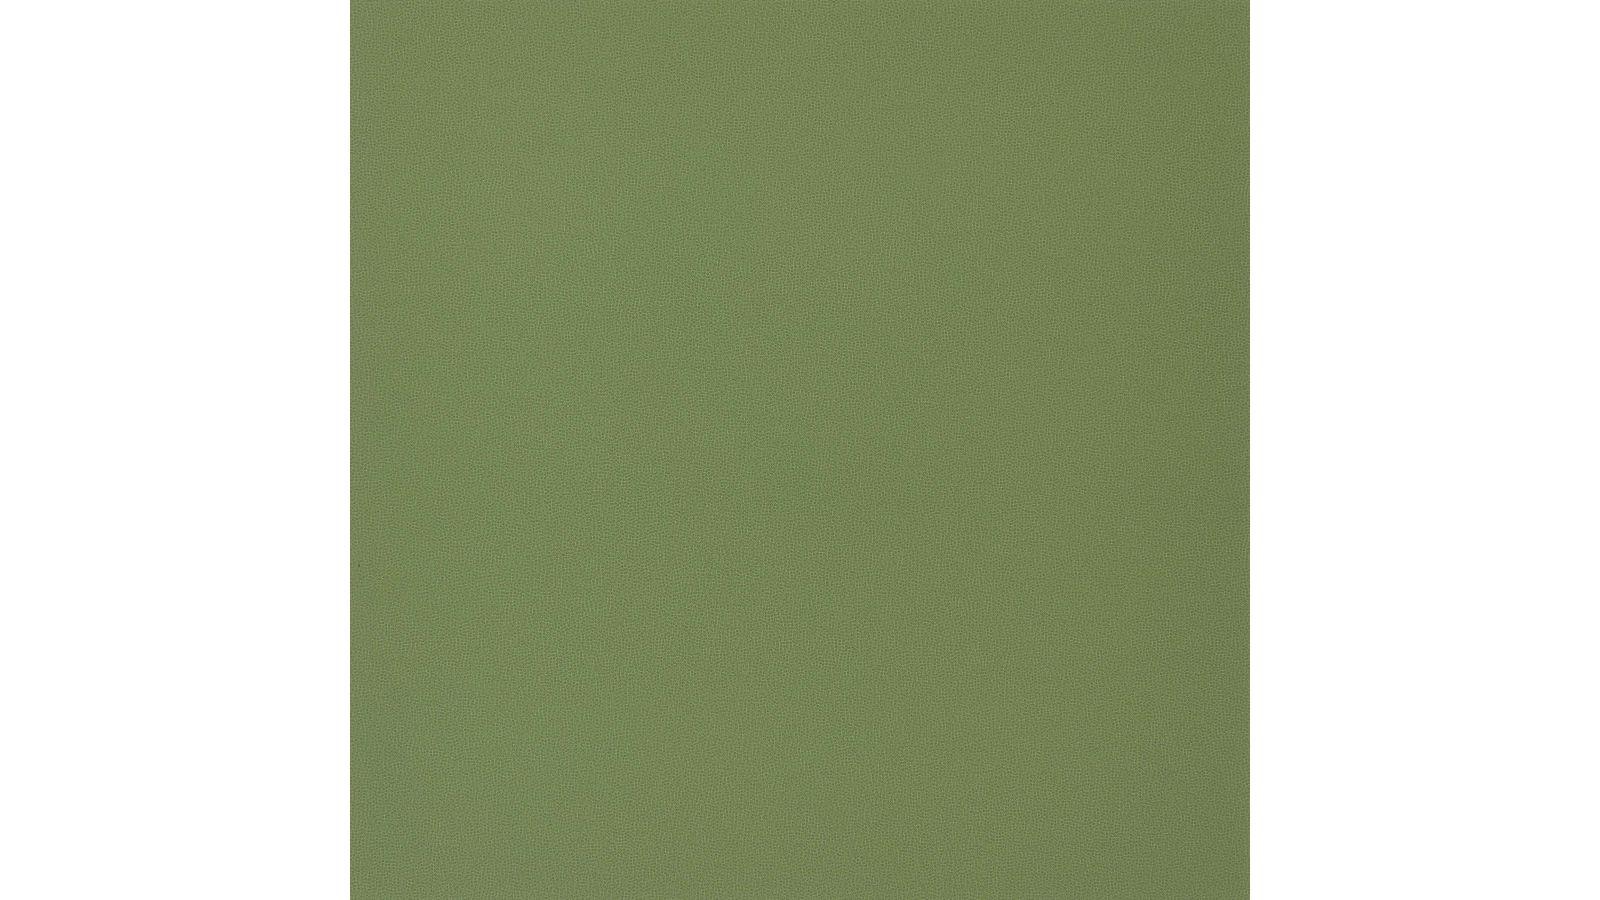 Solid Colors SC507